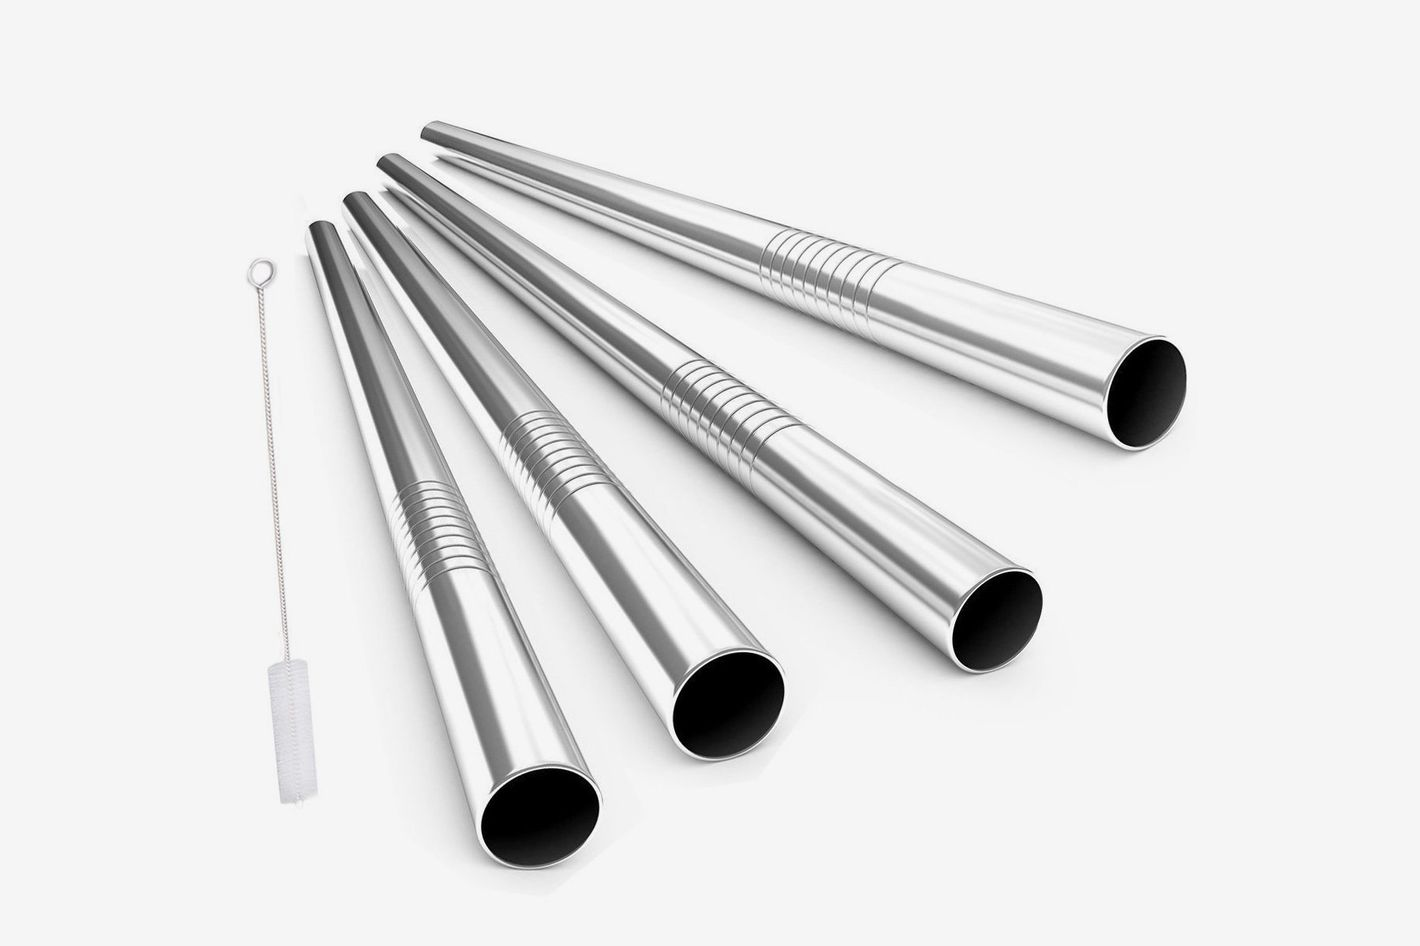 Alink Stainless Steel Drinking Straws